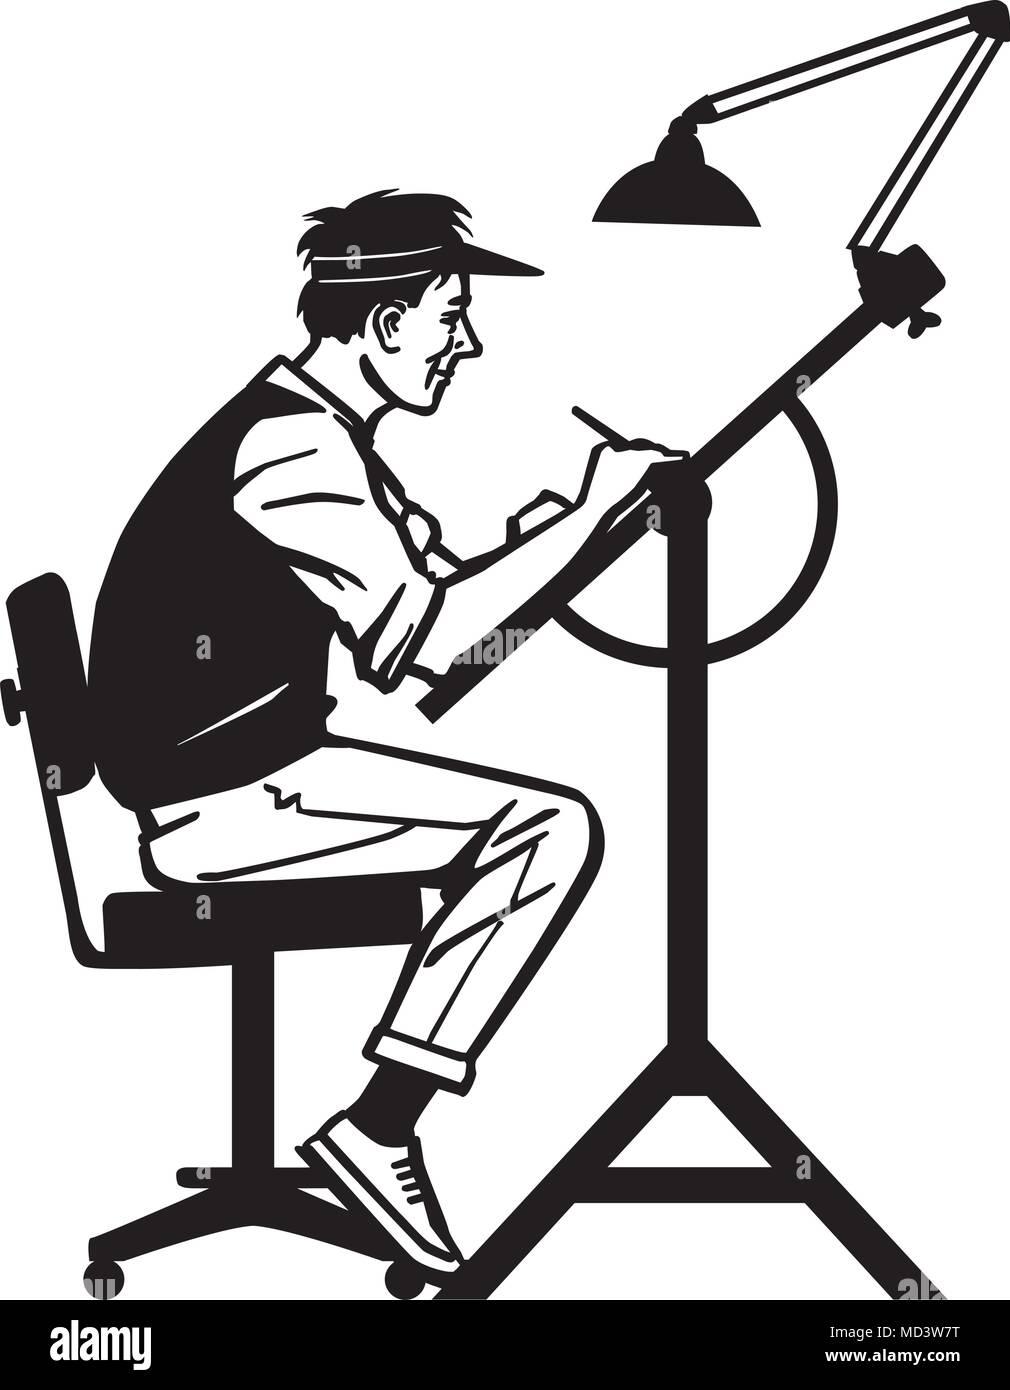 artist at work retro clipart illustration stock vector art